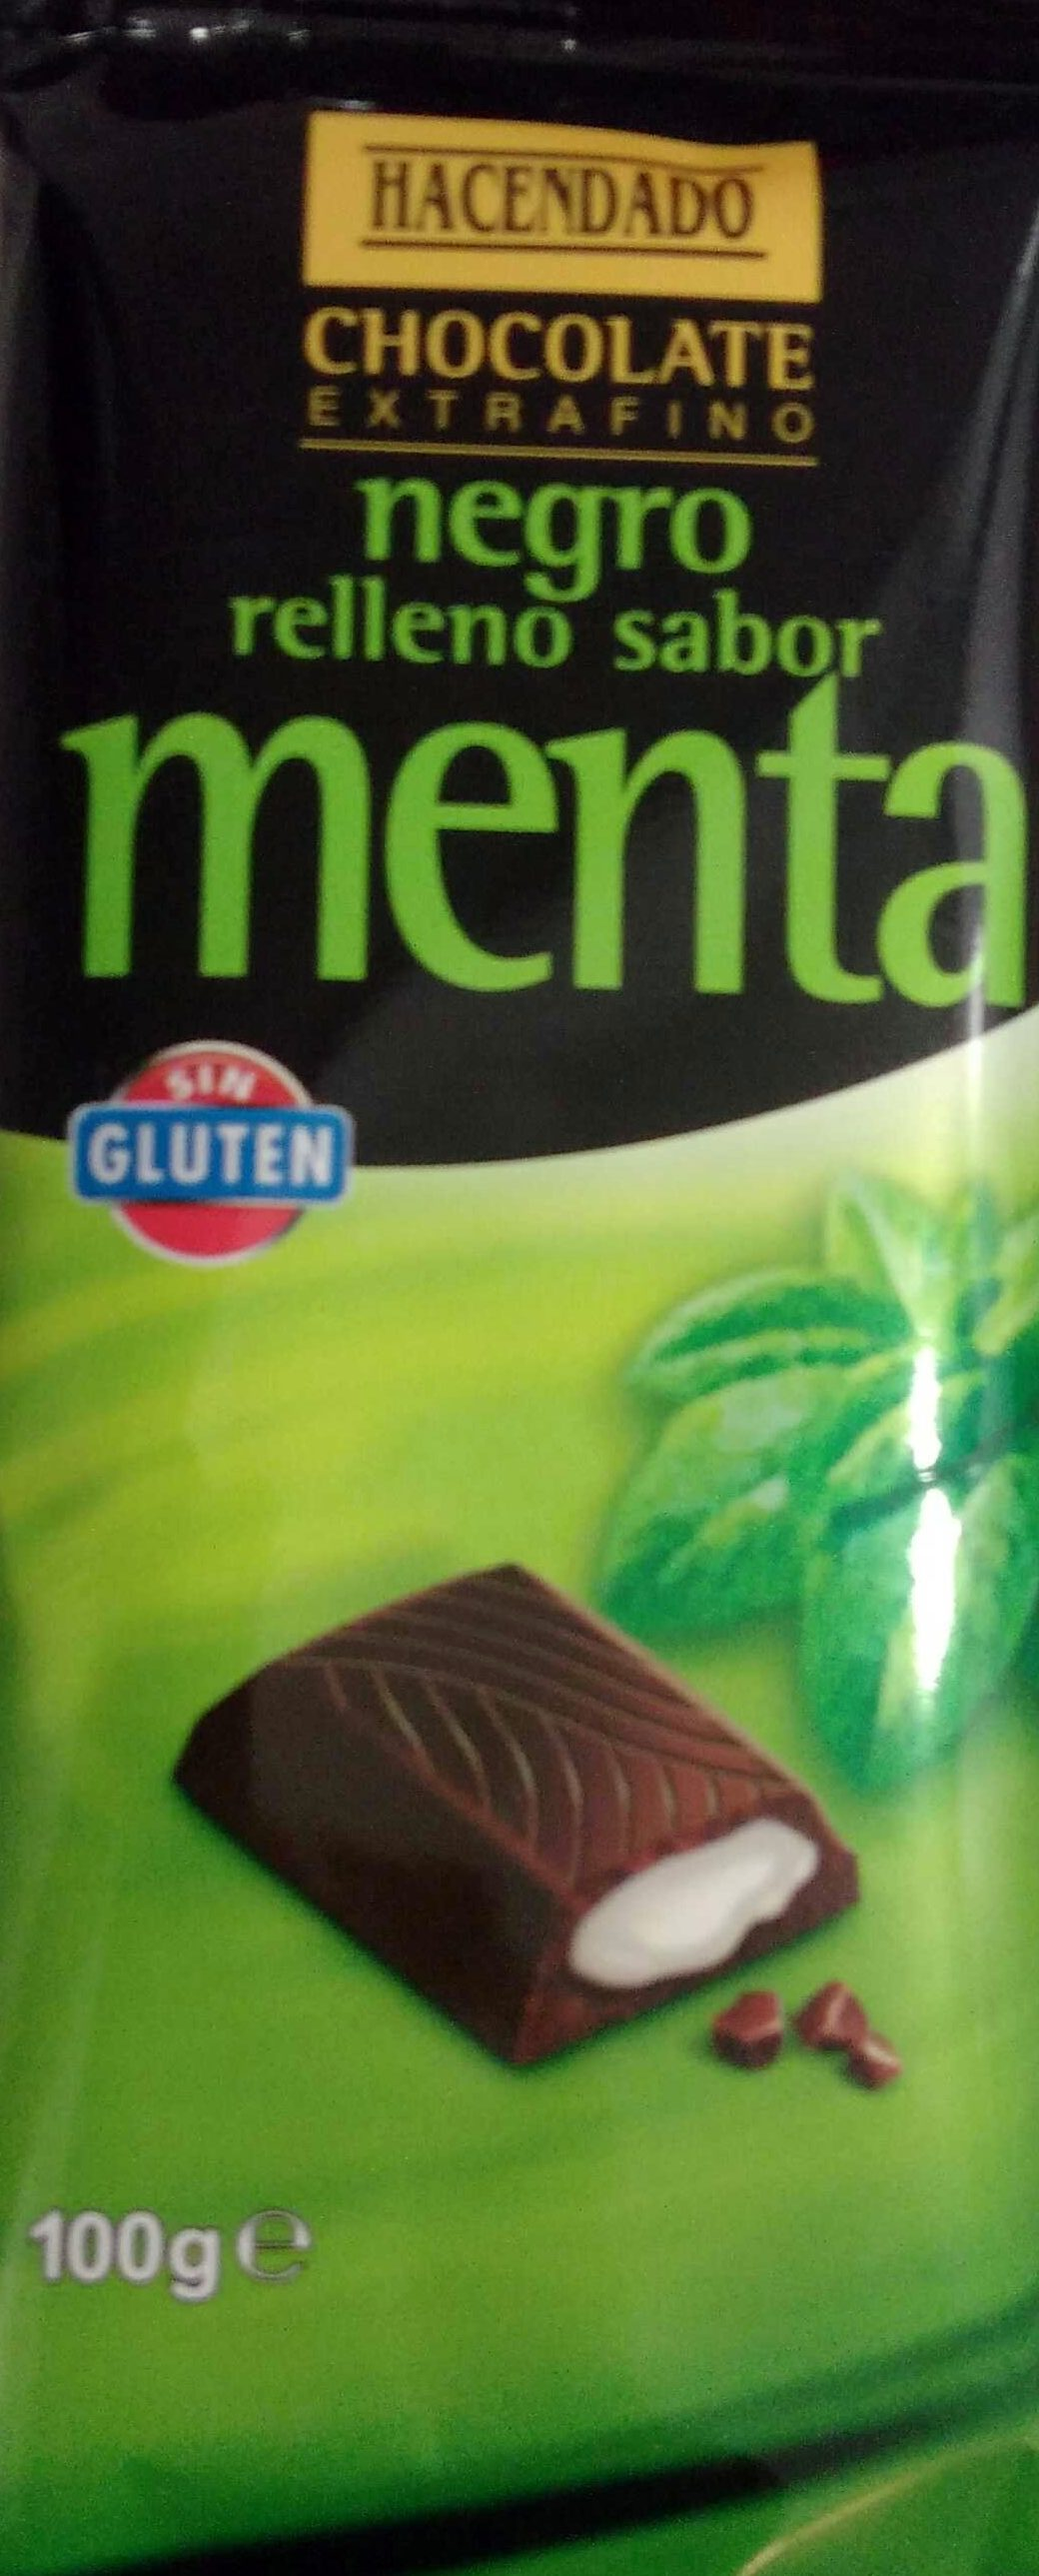 Chocolate negro relleno sabor menta - Product - es